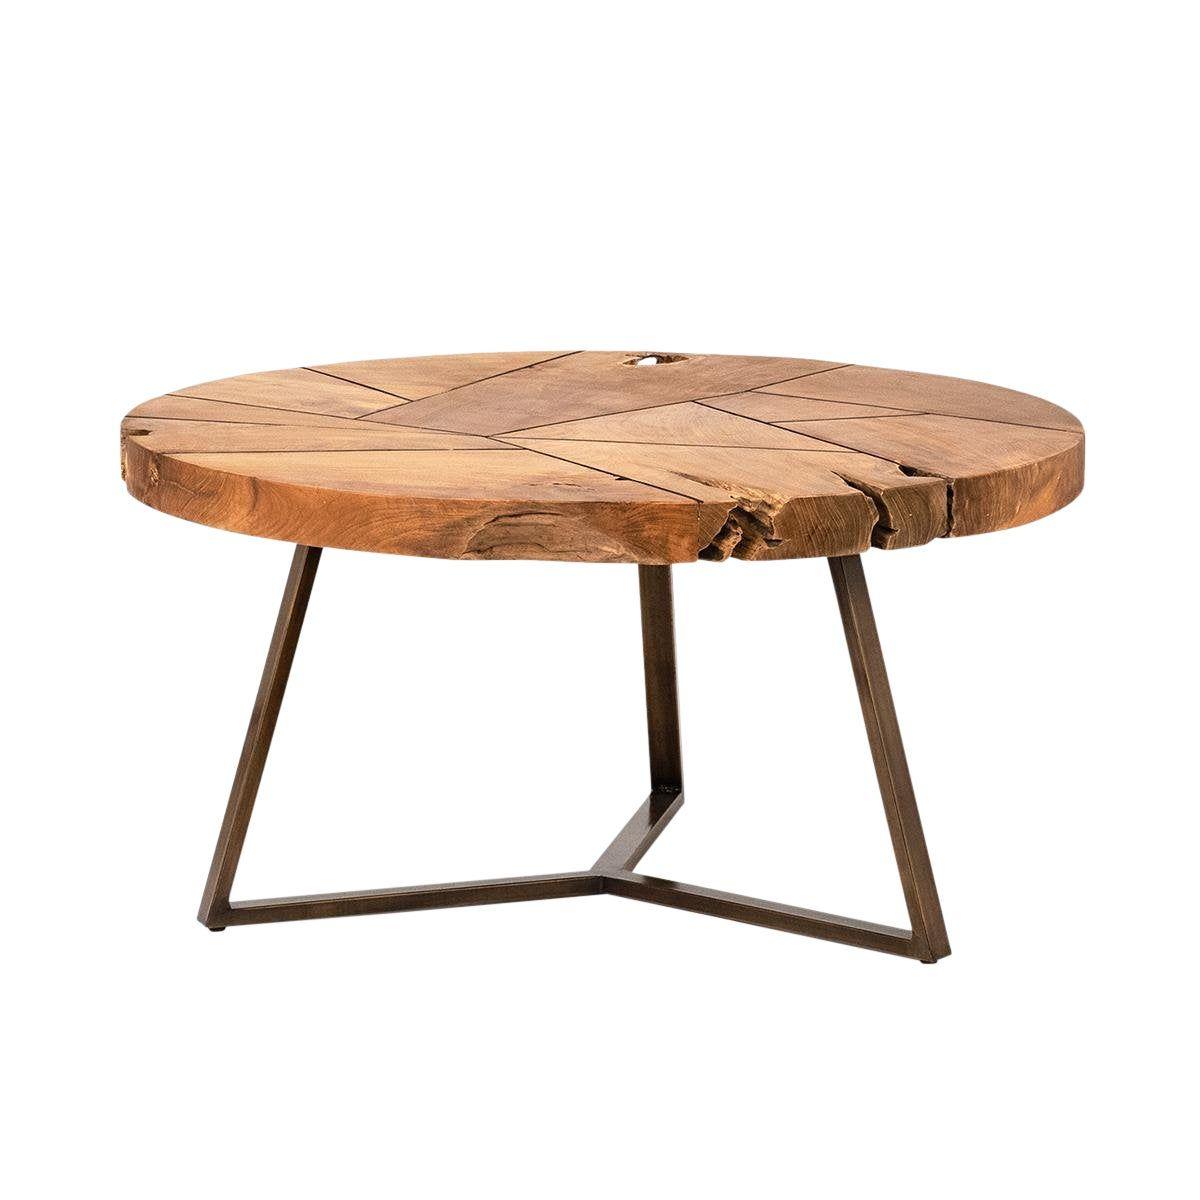 Teak Root Fragments Coffee Table In 2021 Coffee Table Round Wood Coffee Table Wood Coffe Table [ 1200 x 1200 Pixel ]